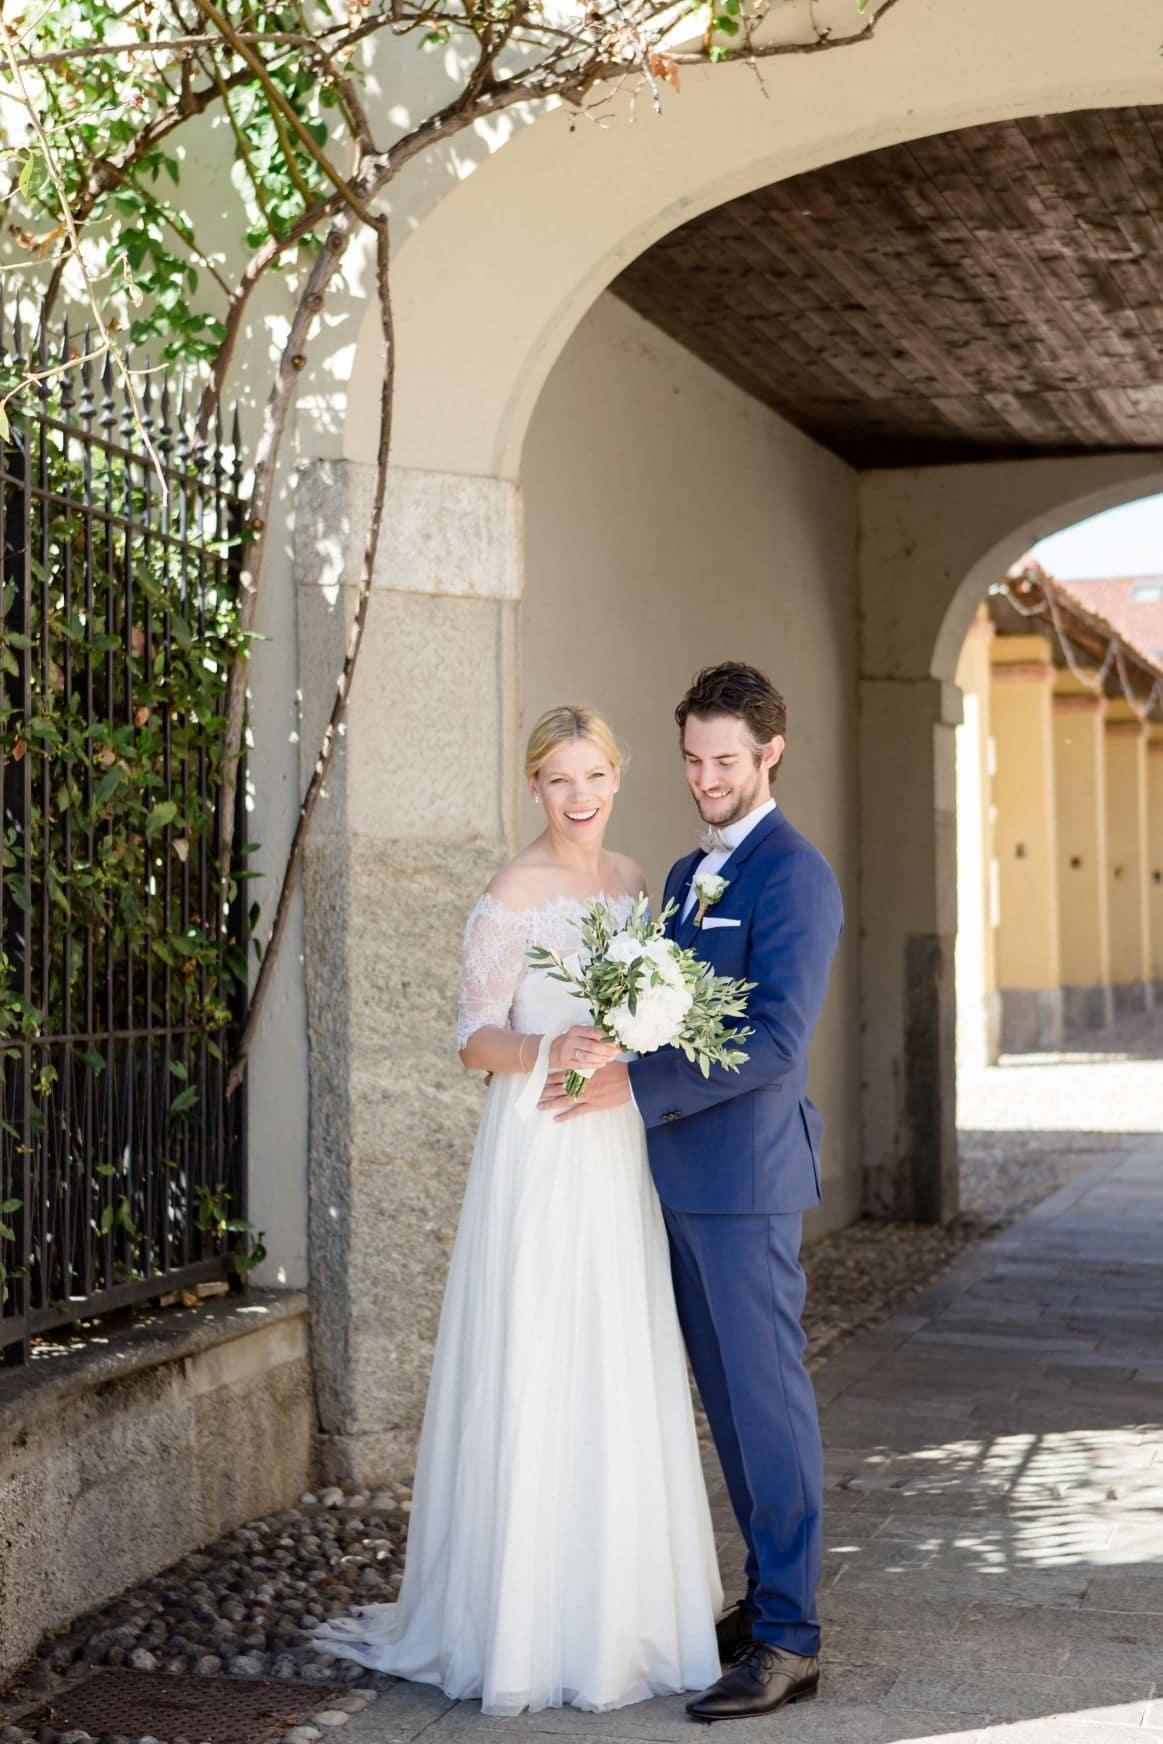 Million Memories_A&D_Hochzeitsfotograf_Schlosshochzeit_Toskana_Lago Di Como_Wedding_Tuscany_110